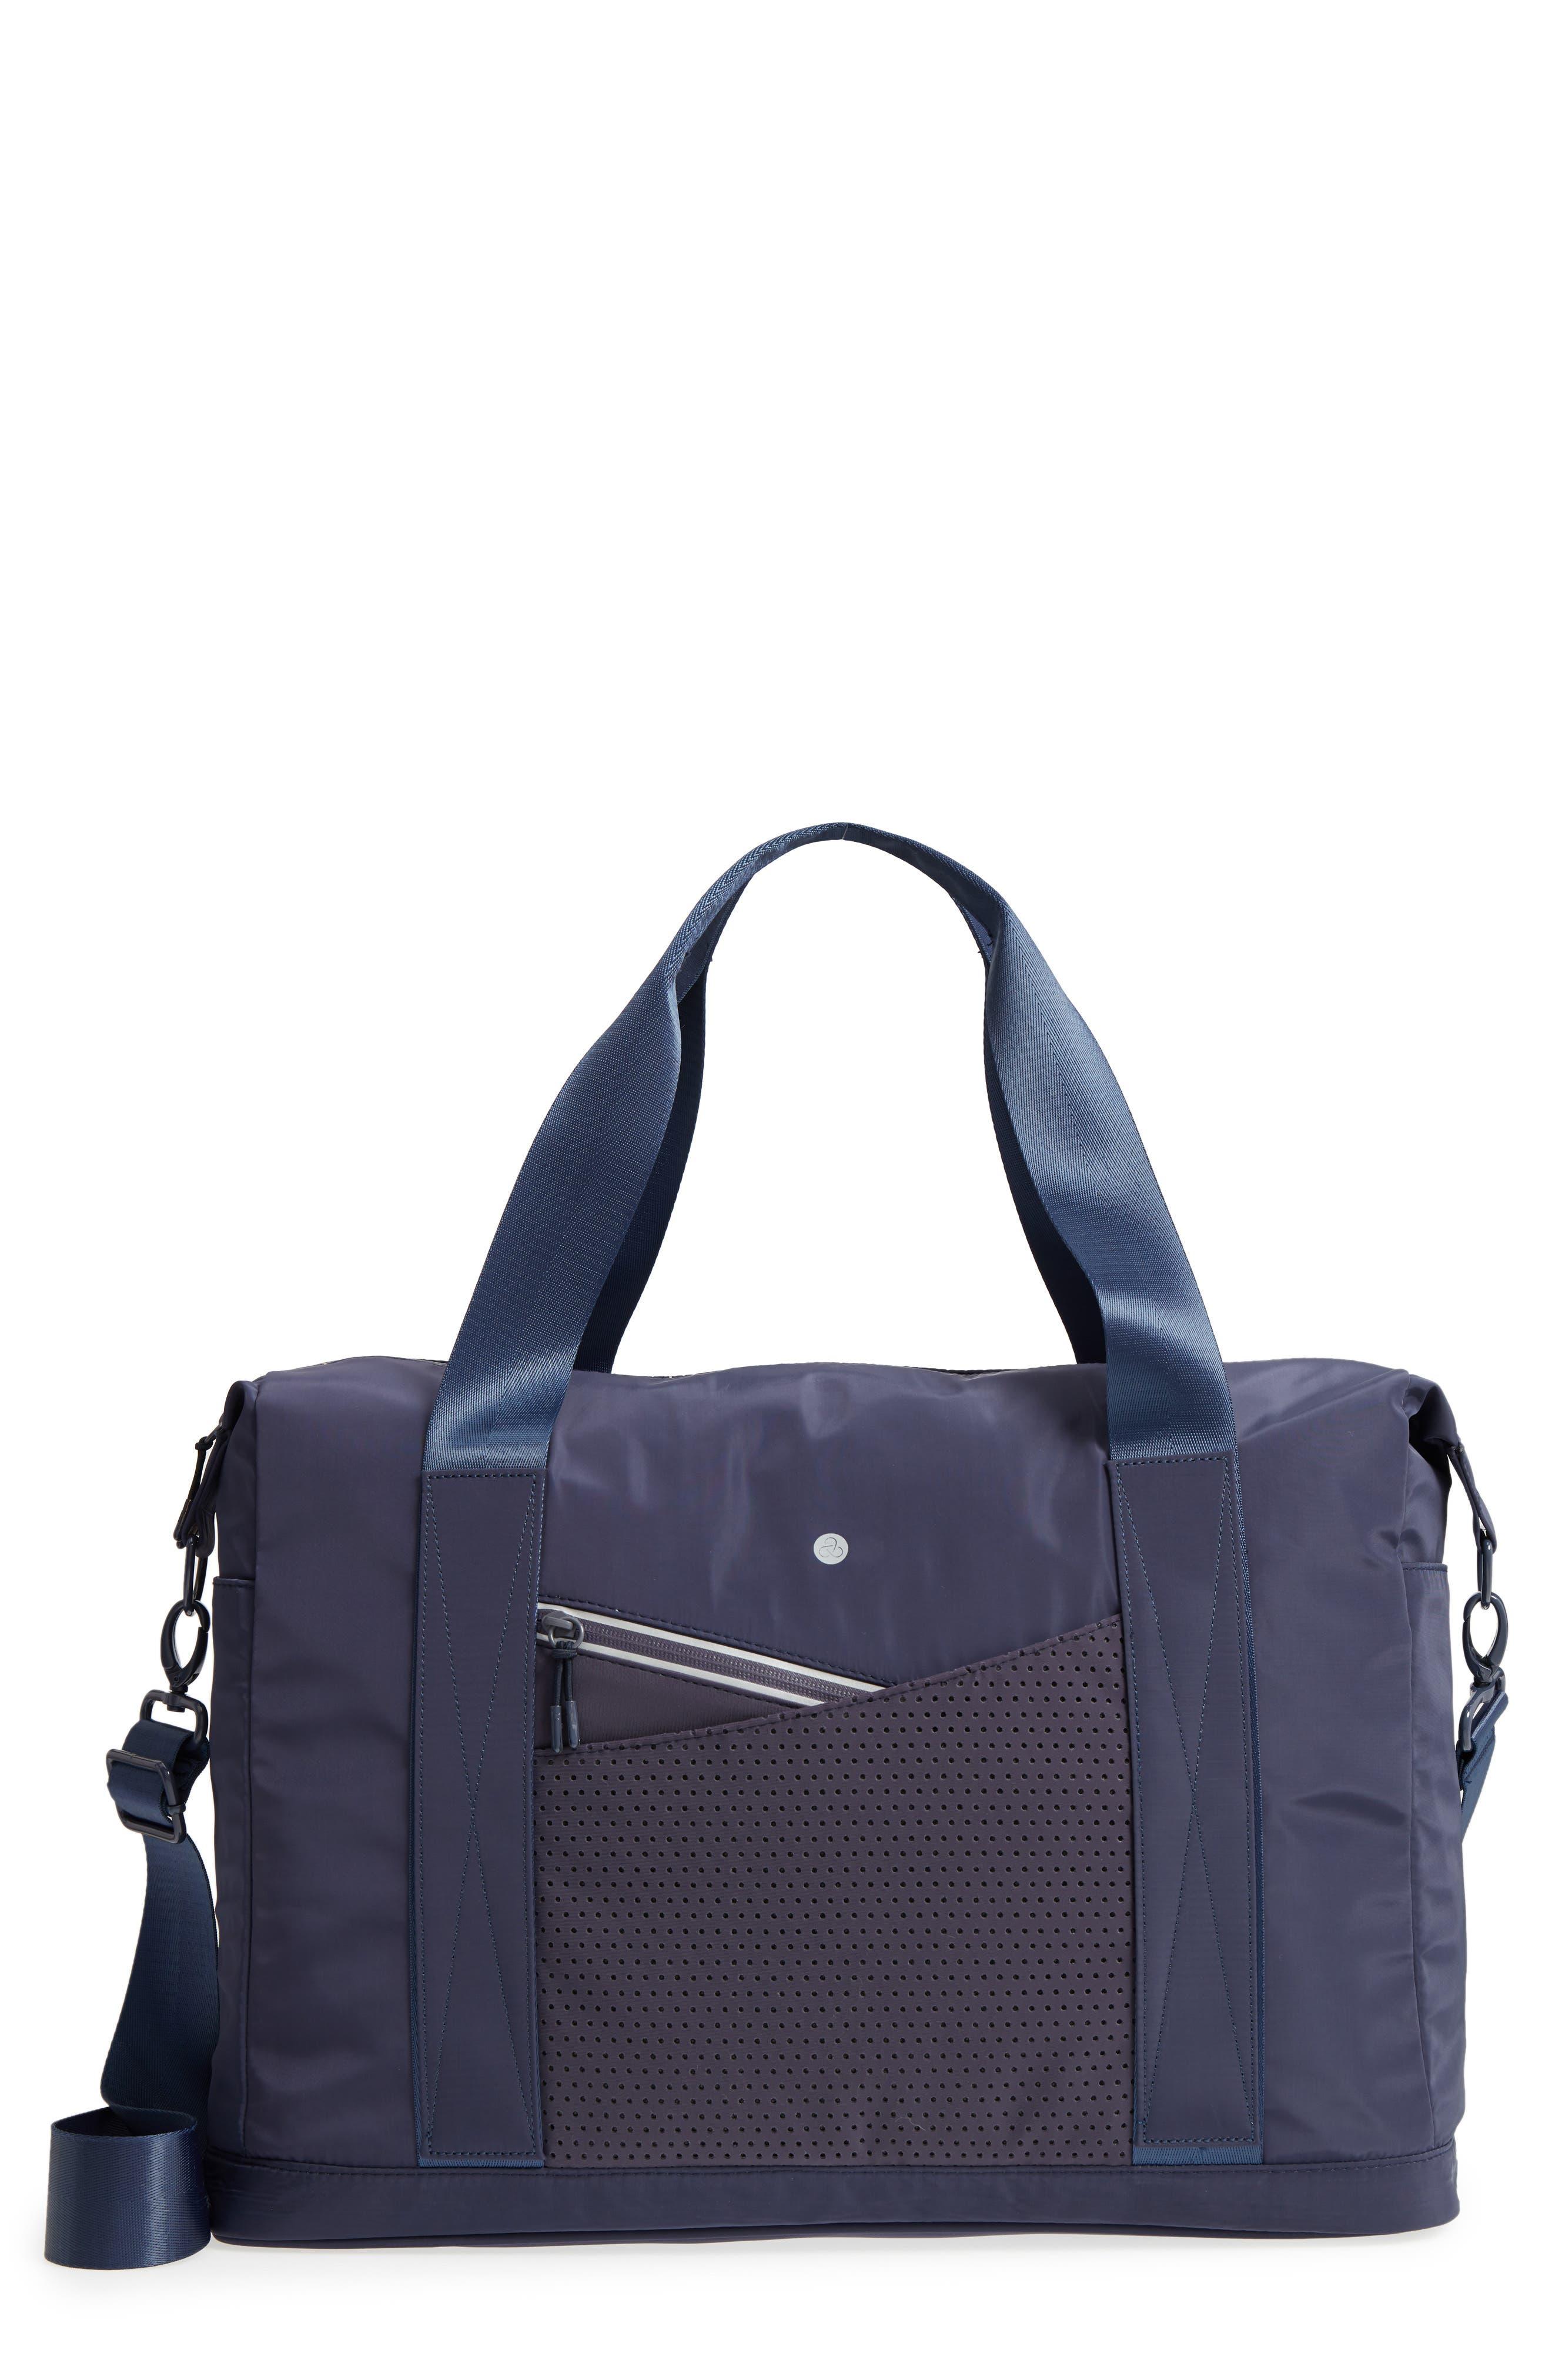 New Perforated Duffel Bag,                             Main thumbnail 1, color,                             NAVY MARITIME